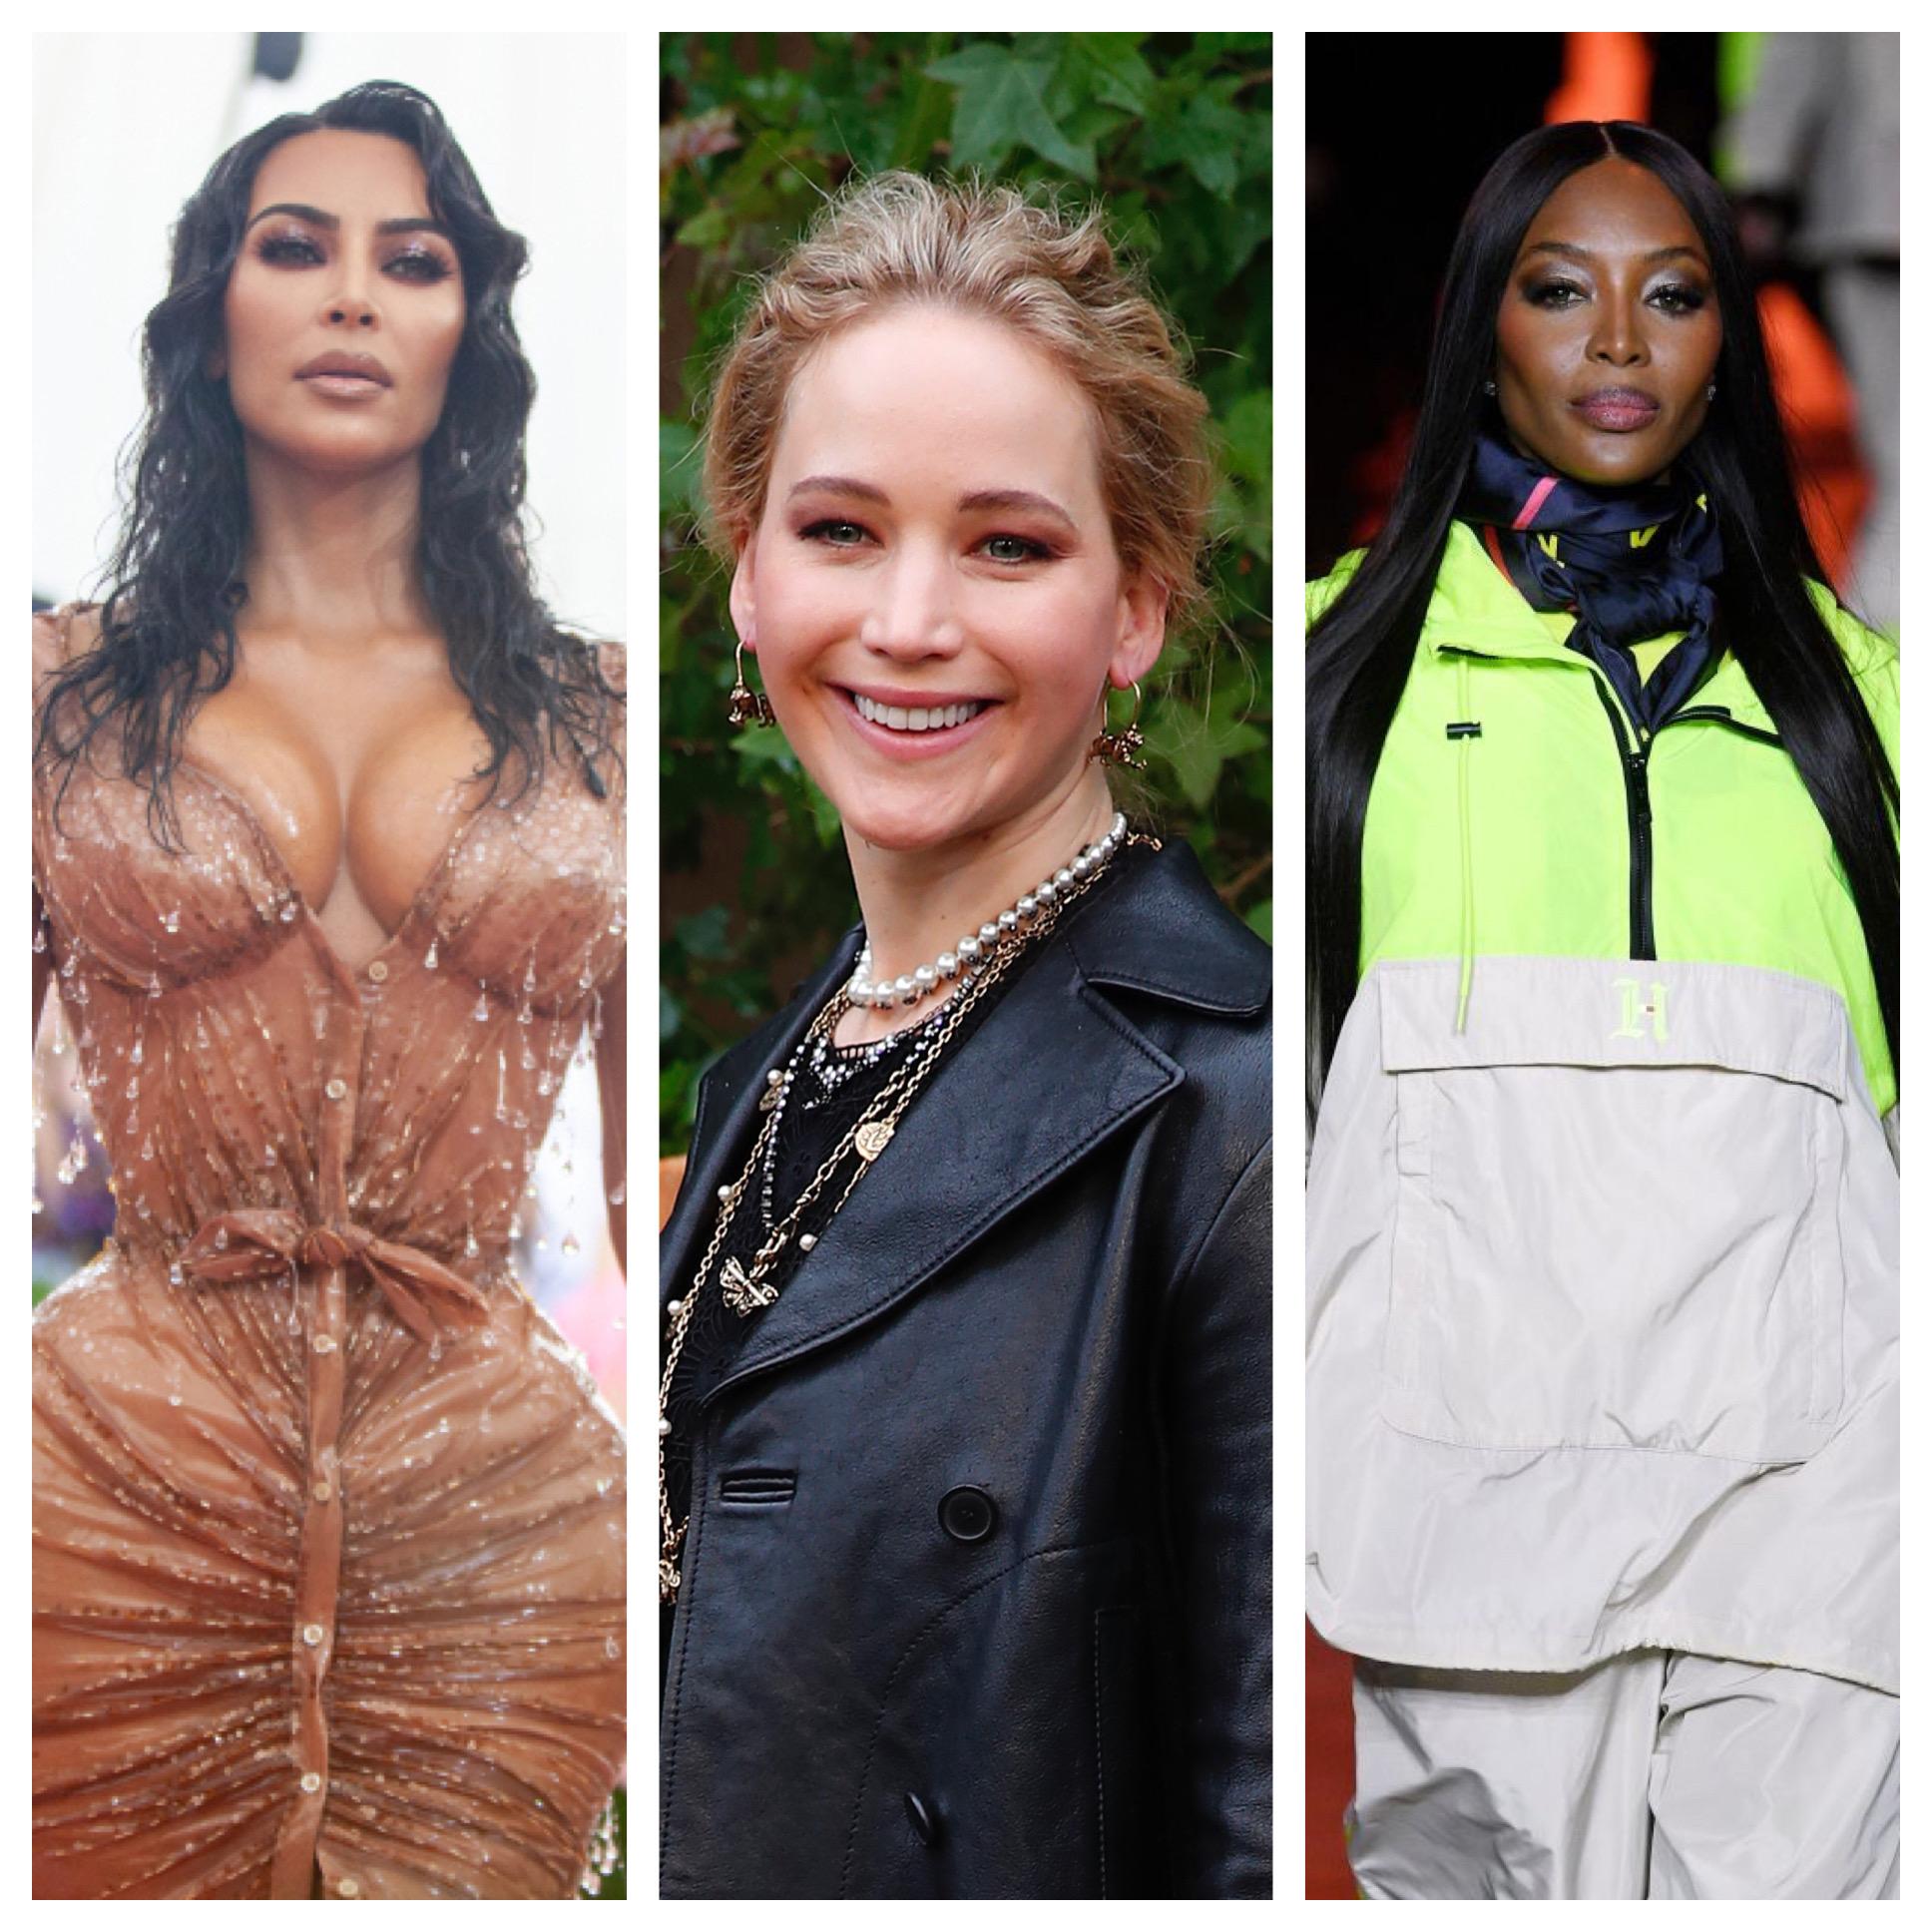 Kim Kardashian West, Jennifer Lawrence and Other Major Celebrities Join #StopHateForProfit Campaign